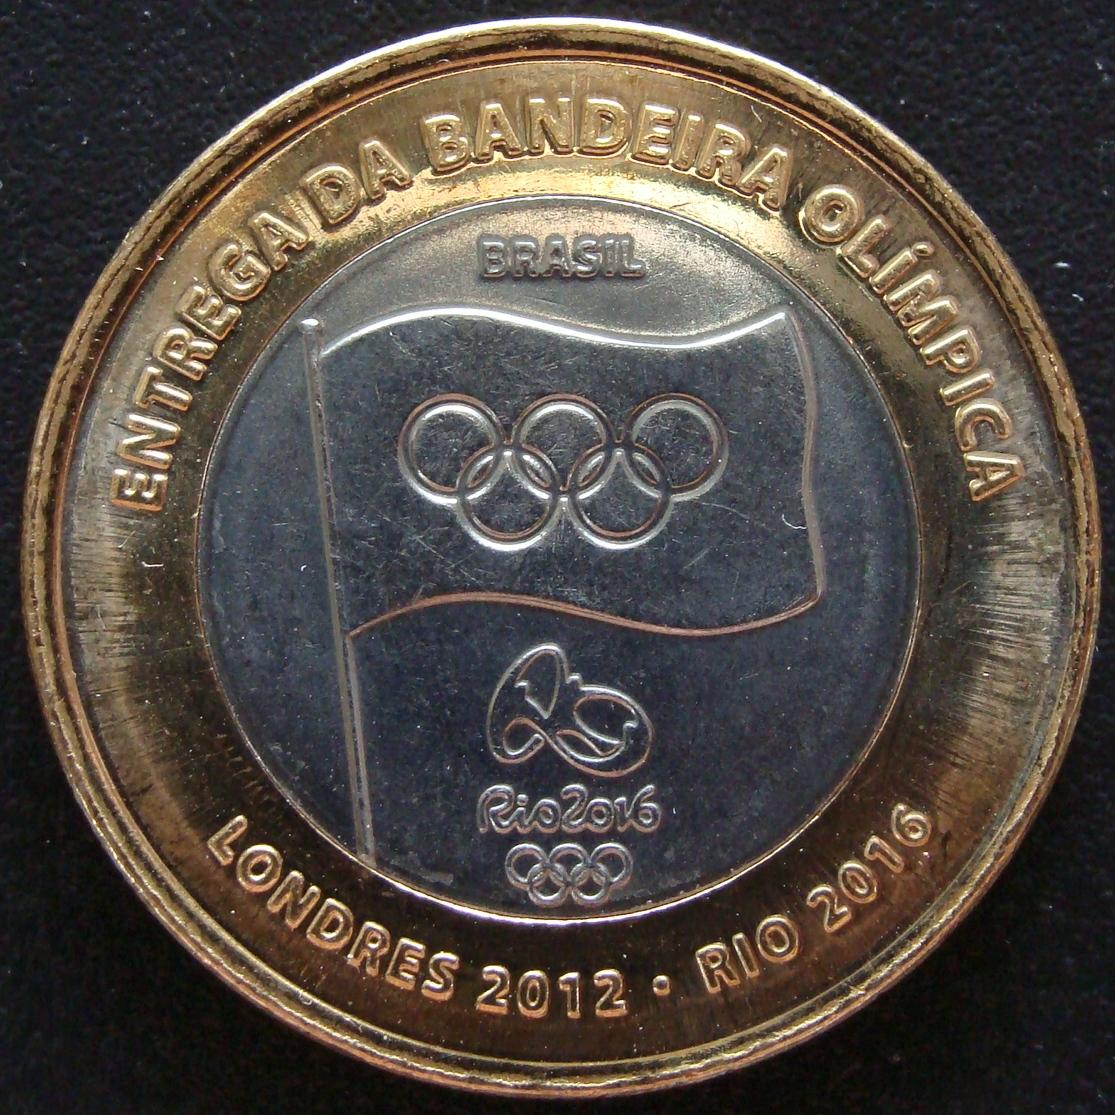 1 Real. Brasil (2012) Bandera Olímpica BRA_1_Real_Entrega_bandera_ol_mpica_anv